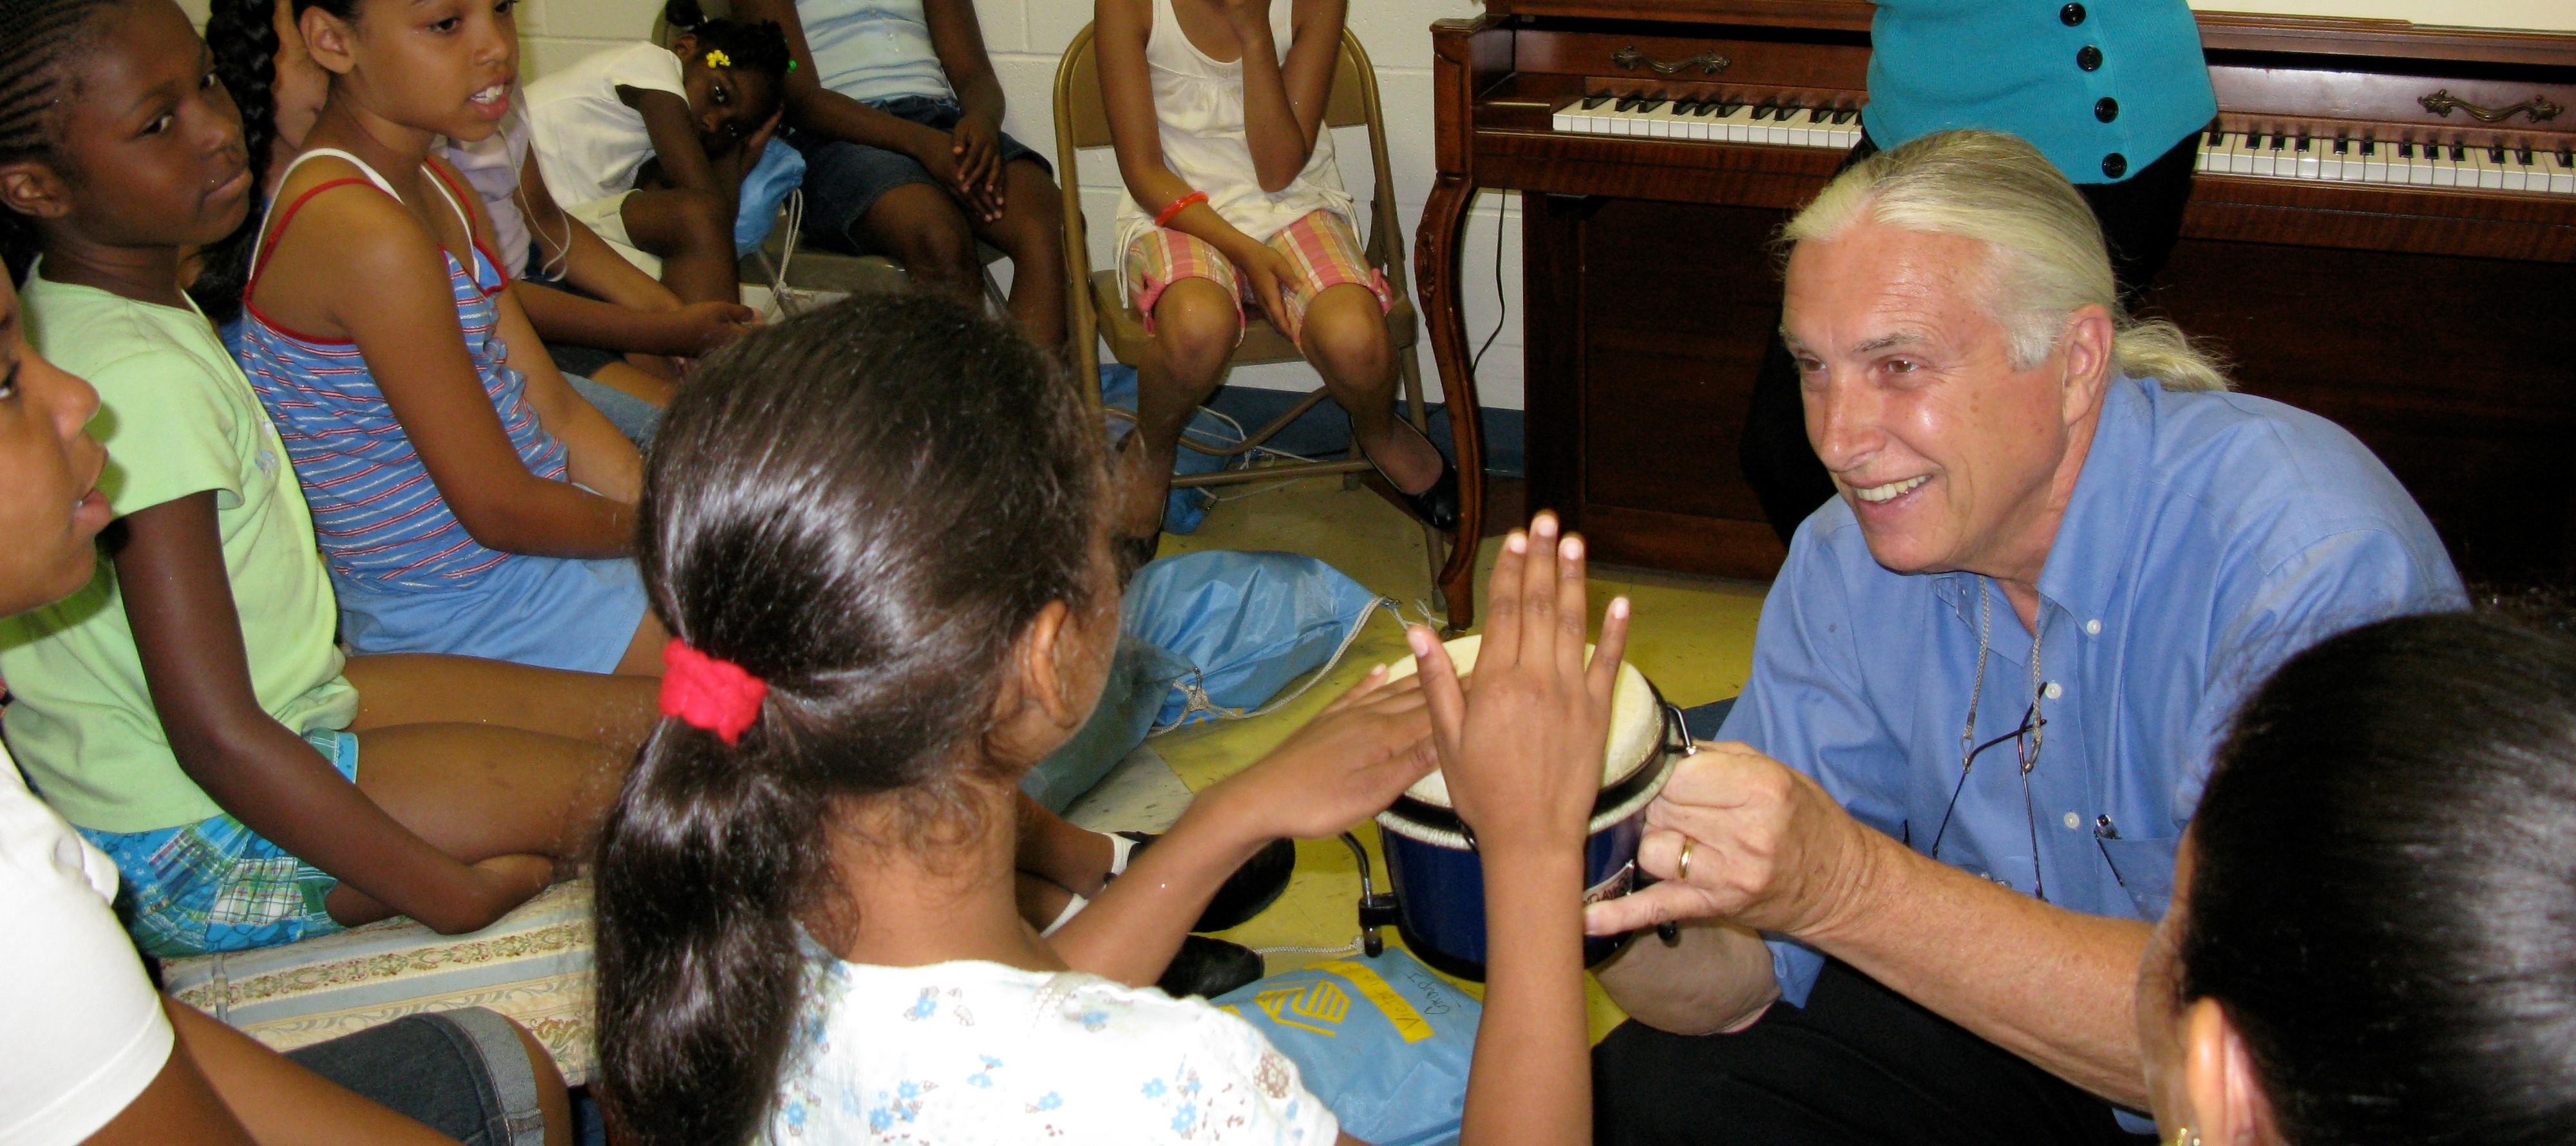 Outreach programs for children